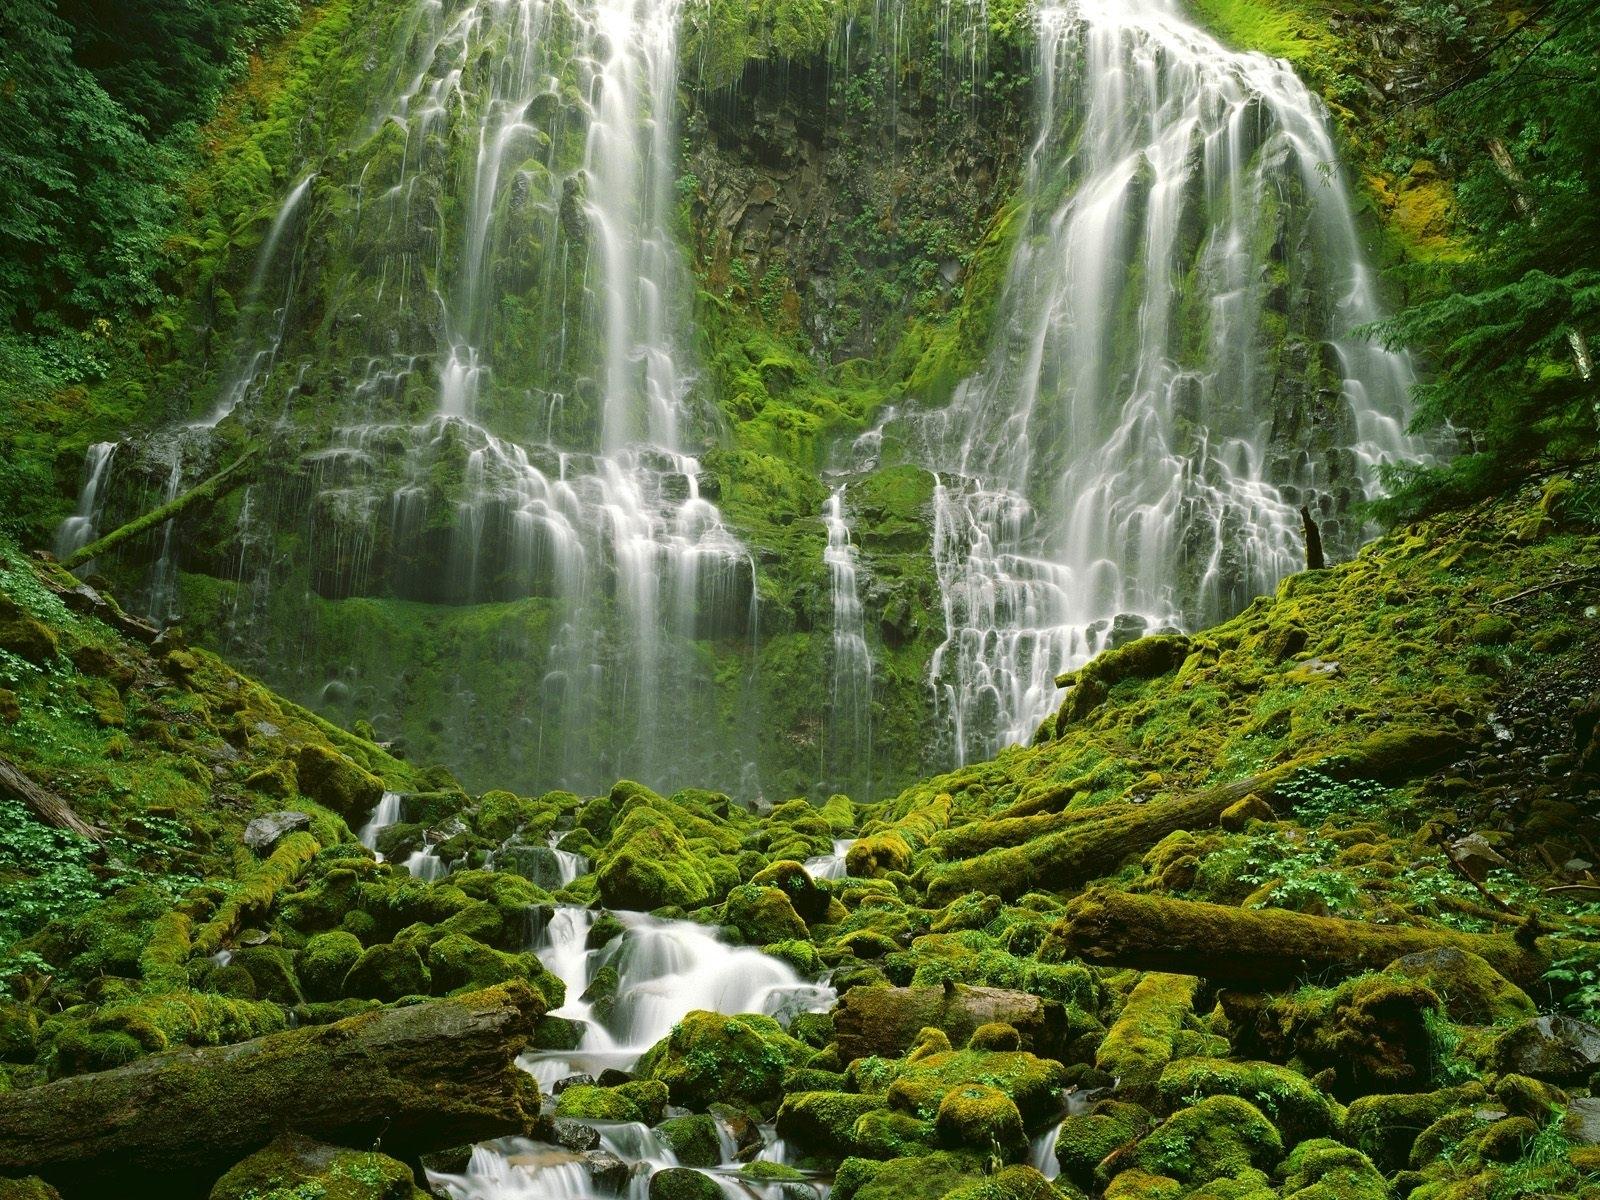 Moss Nature Vegetation Water Waterfall 1600x1200